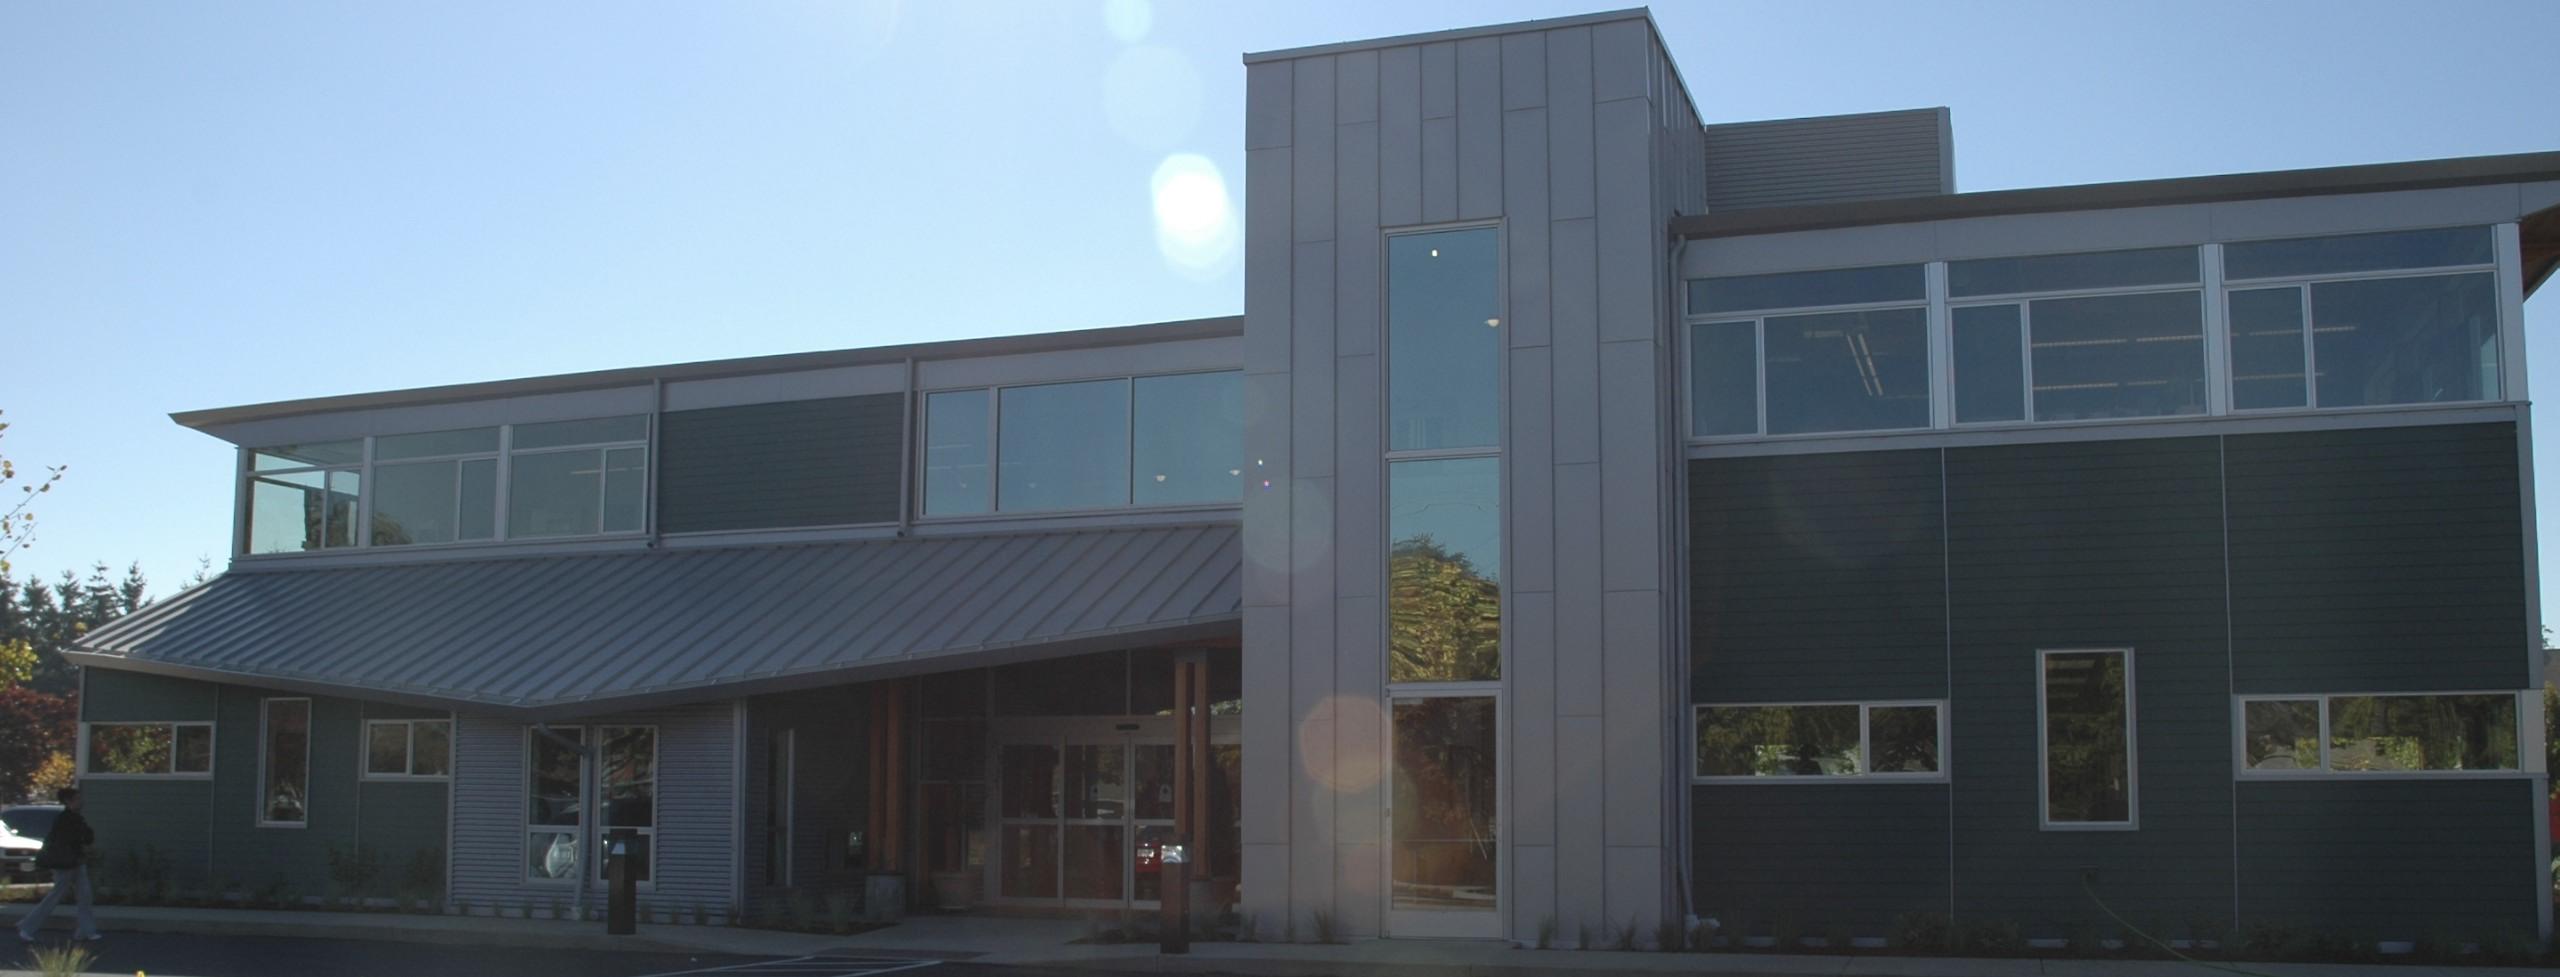 Community Resources Childhood Health Associates Of Salem